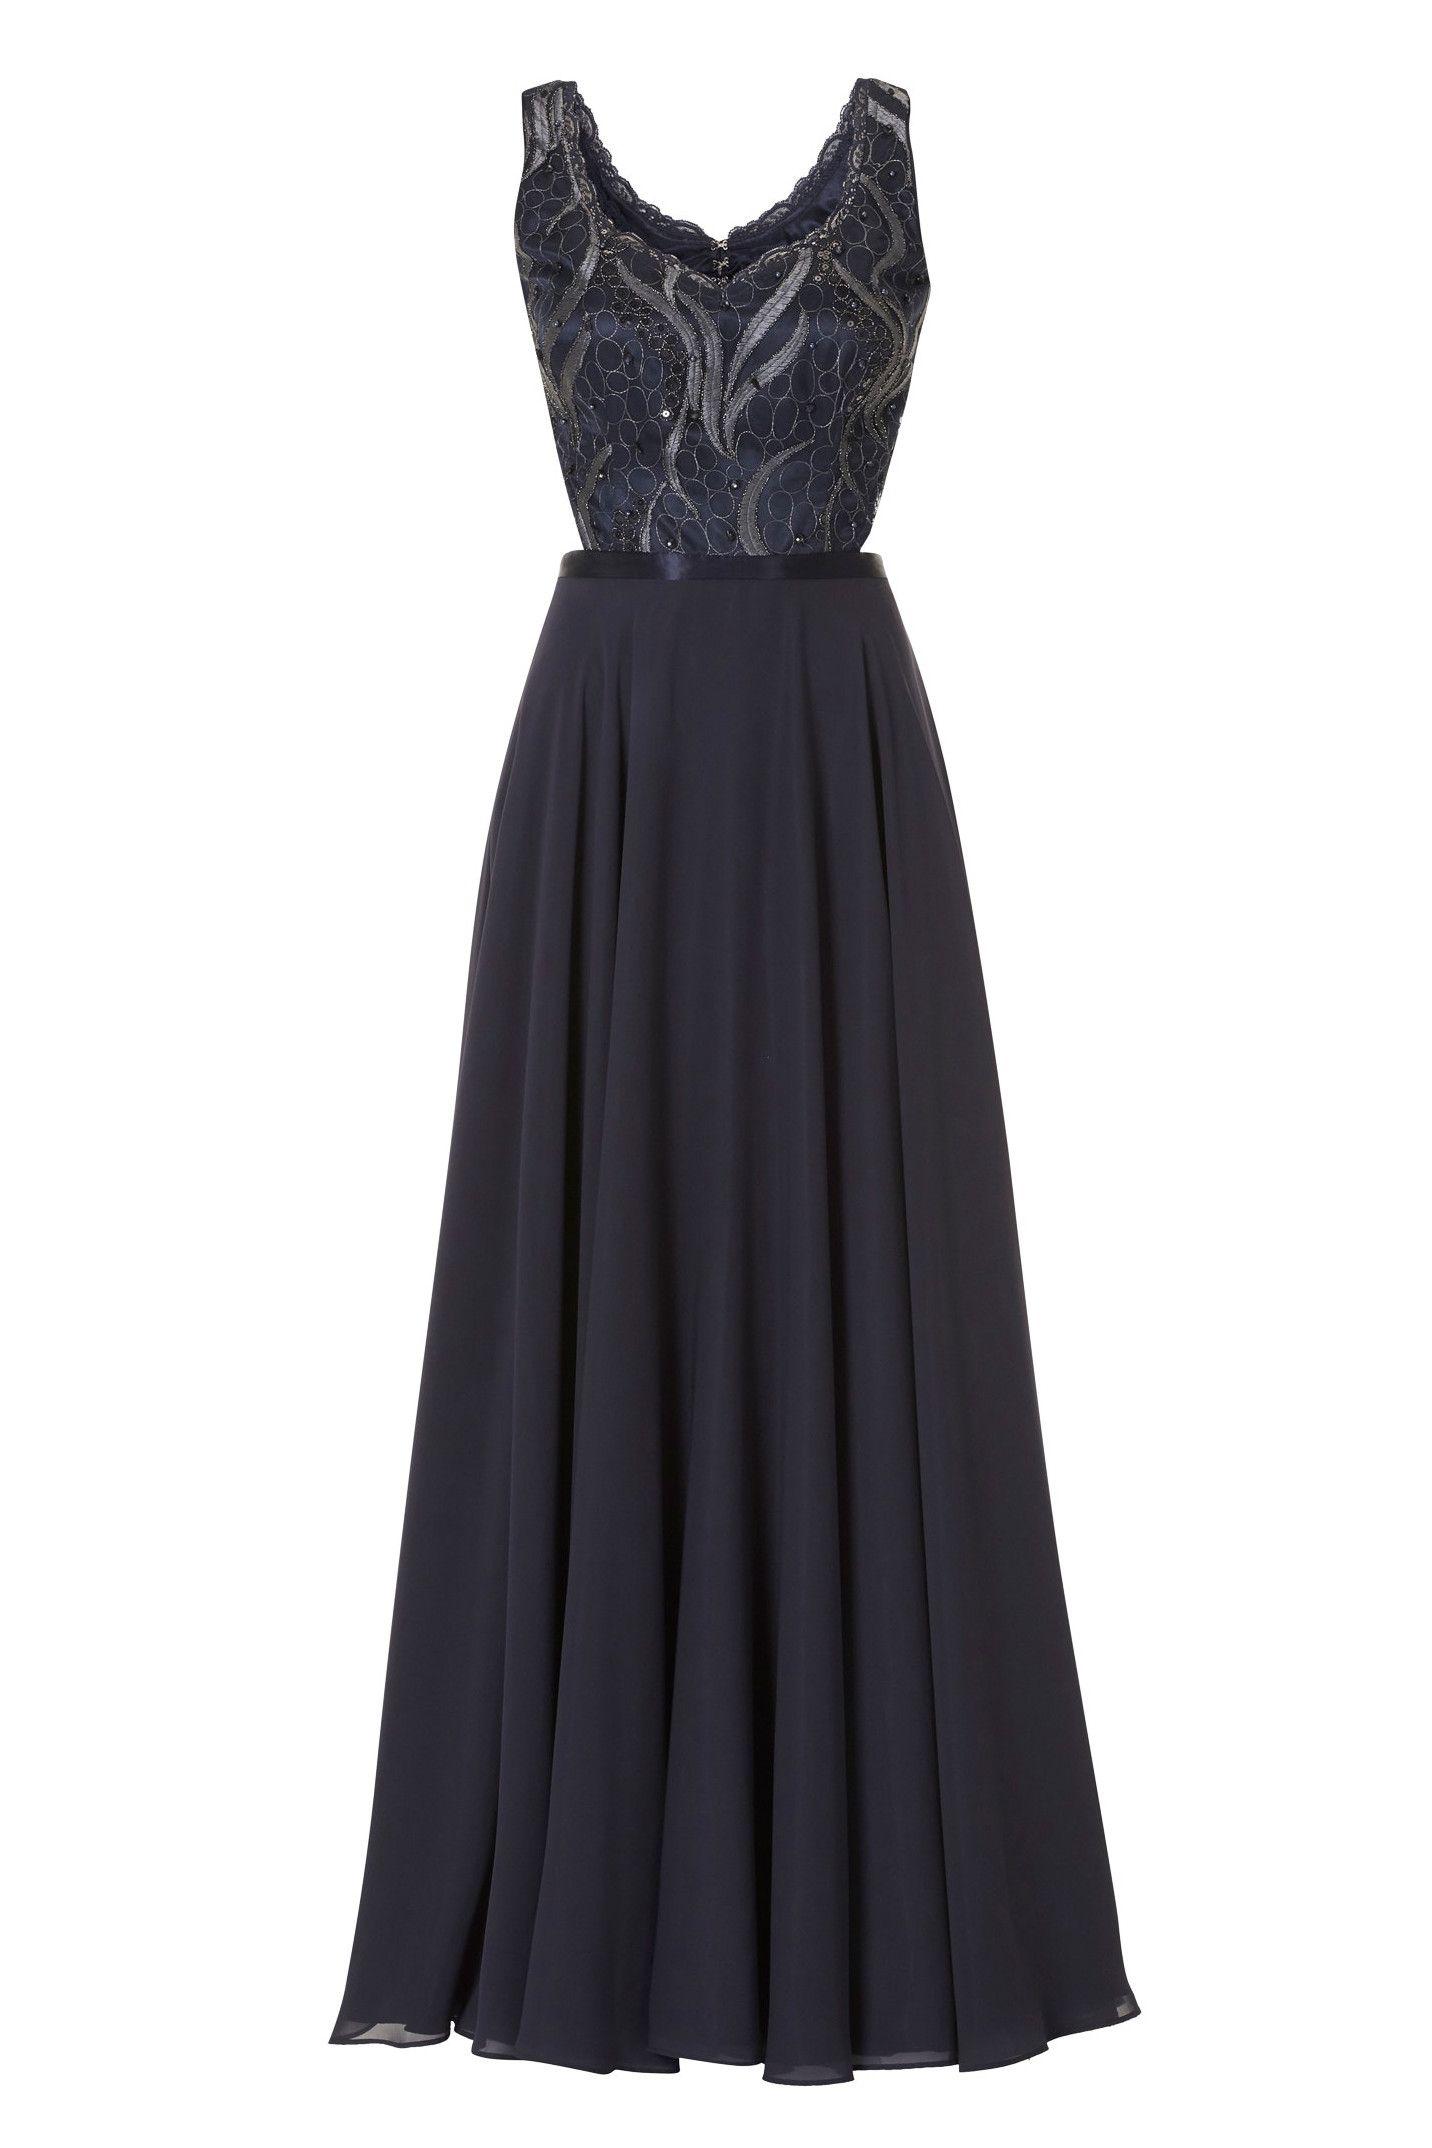 Brautjungfernkleid   Abendkleid, Chiffon kleid, Brautmode